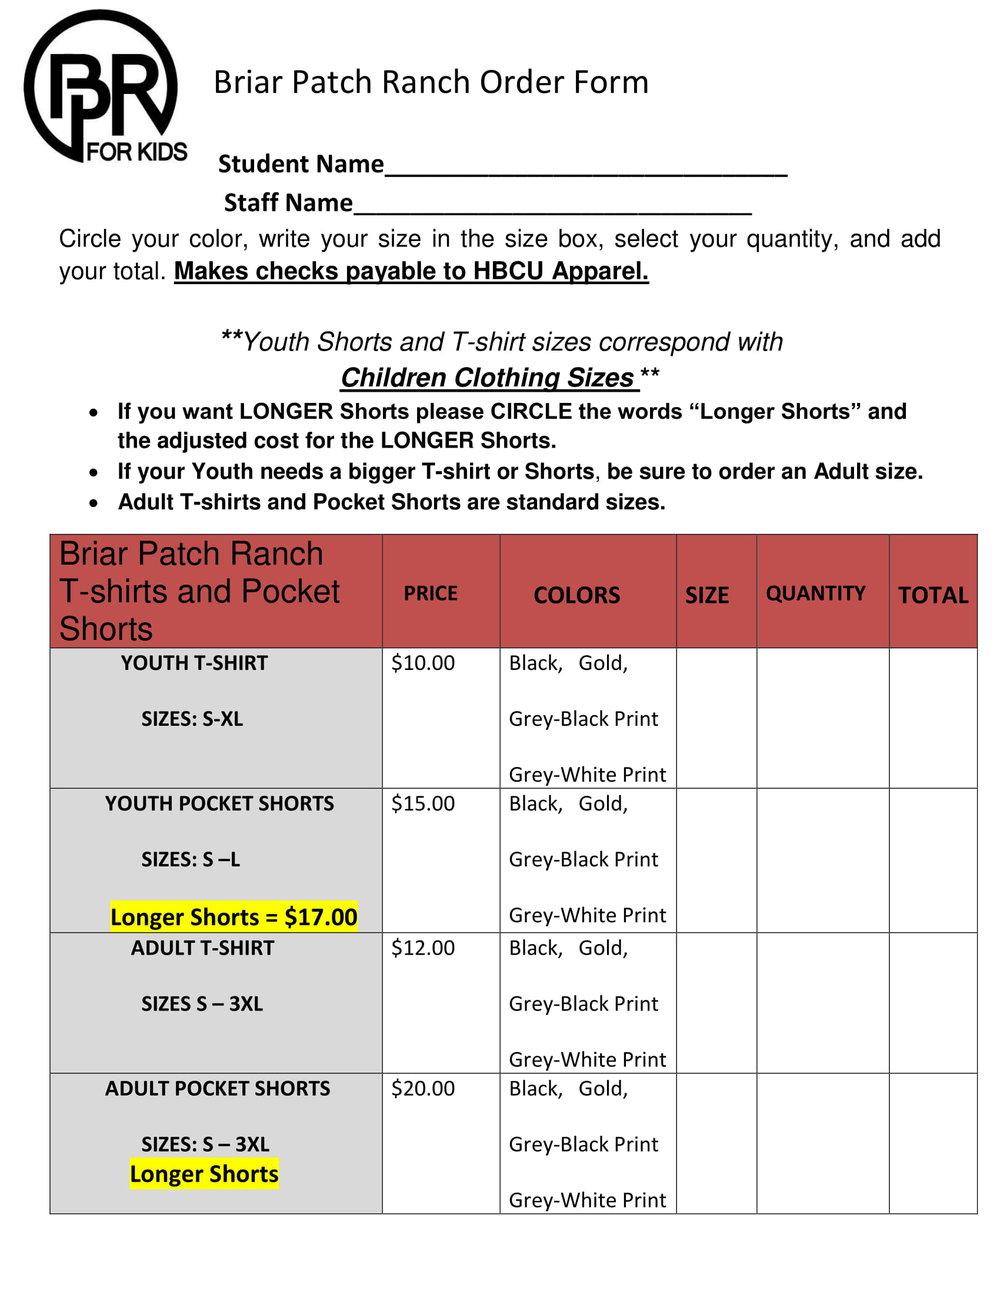 6-28-2018 Summer Briar Patch Order Form-KIDS-1.jpg